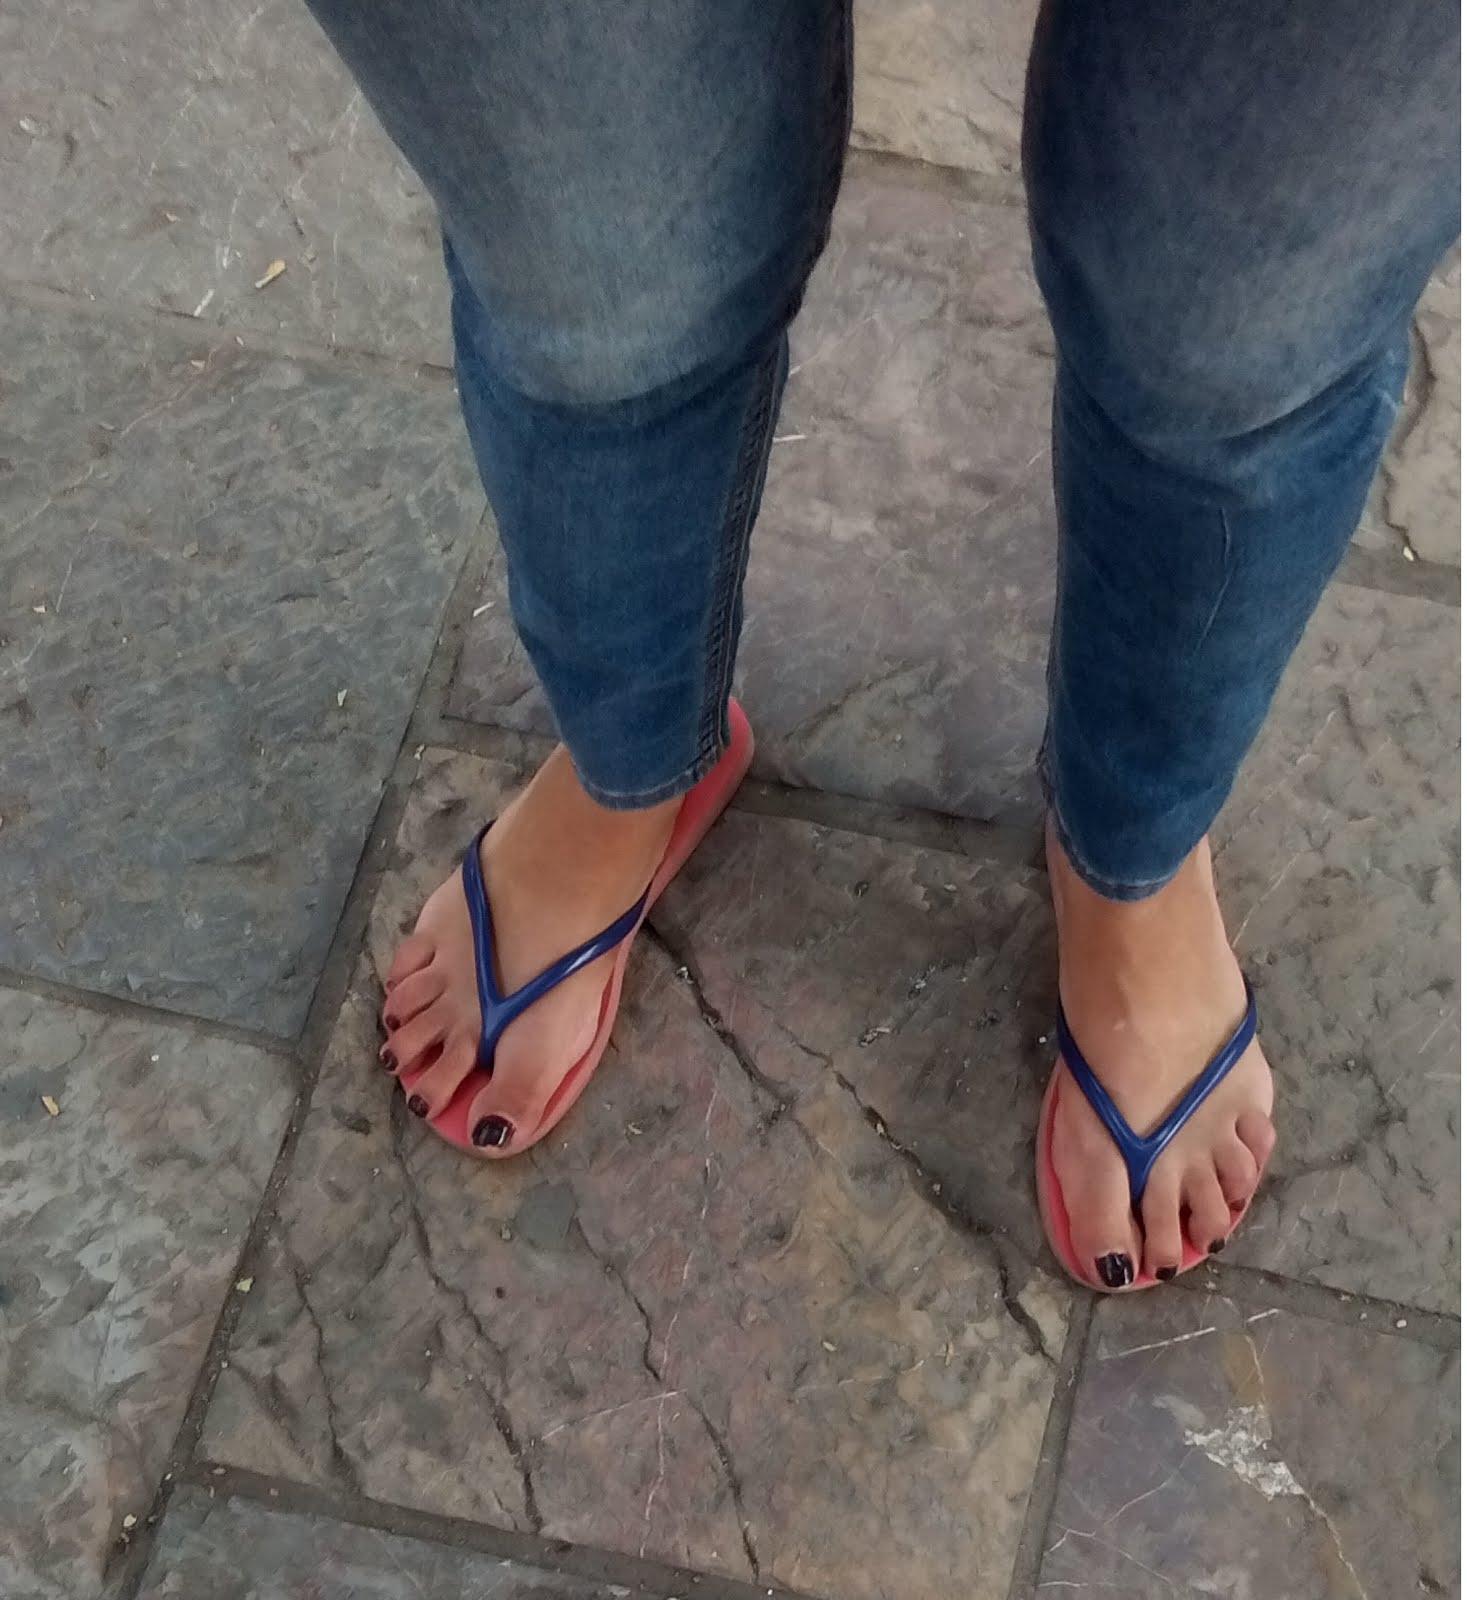 Linda chica con hermosos pies 2